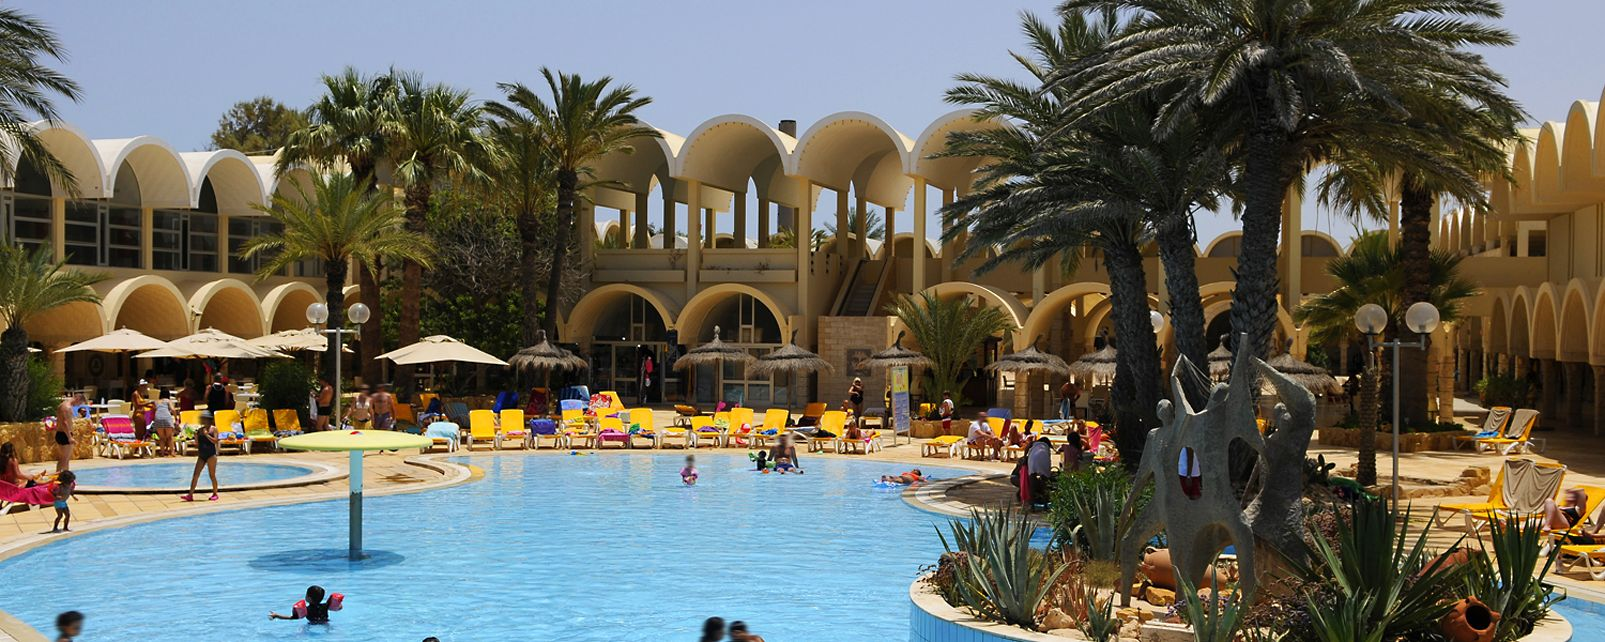 Hotel club m dahlia dar djerba in djerba tunisia for Hotels djerba